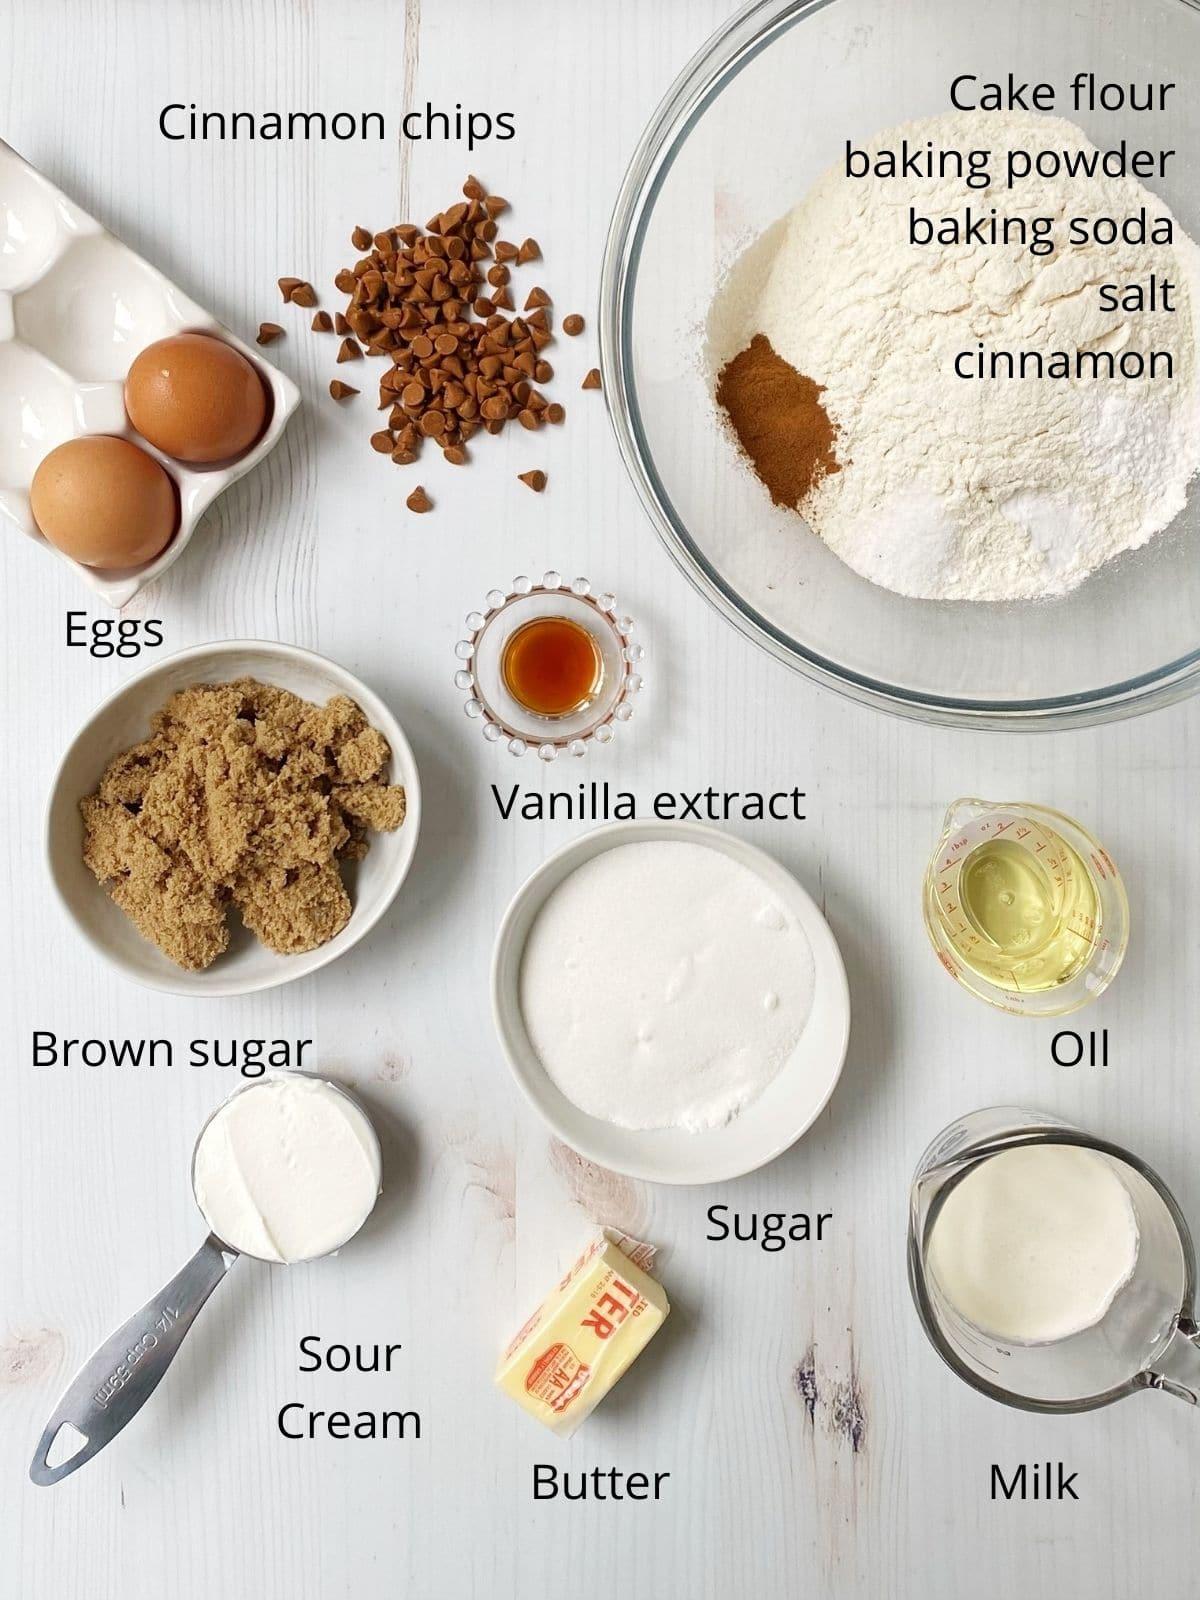 array of eggs, flour, sugars, milk, oil, sour cream, cinnamon chips, baking powder, baking soda, salt, ground cinnamon, butter